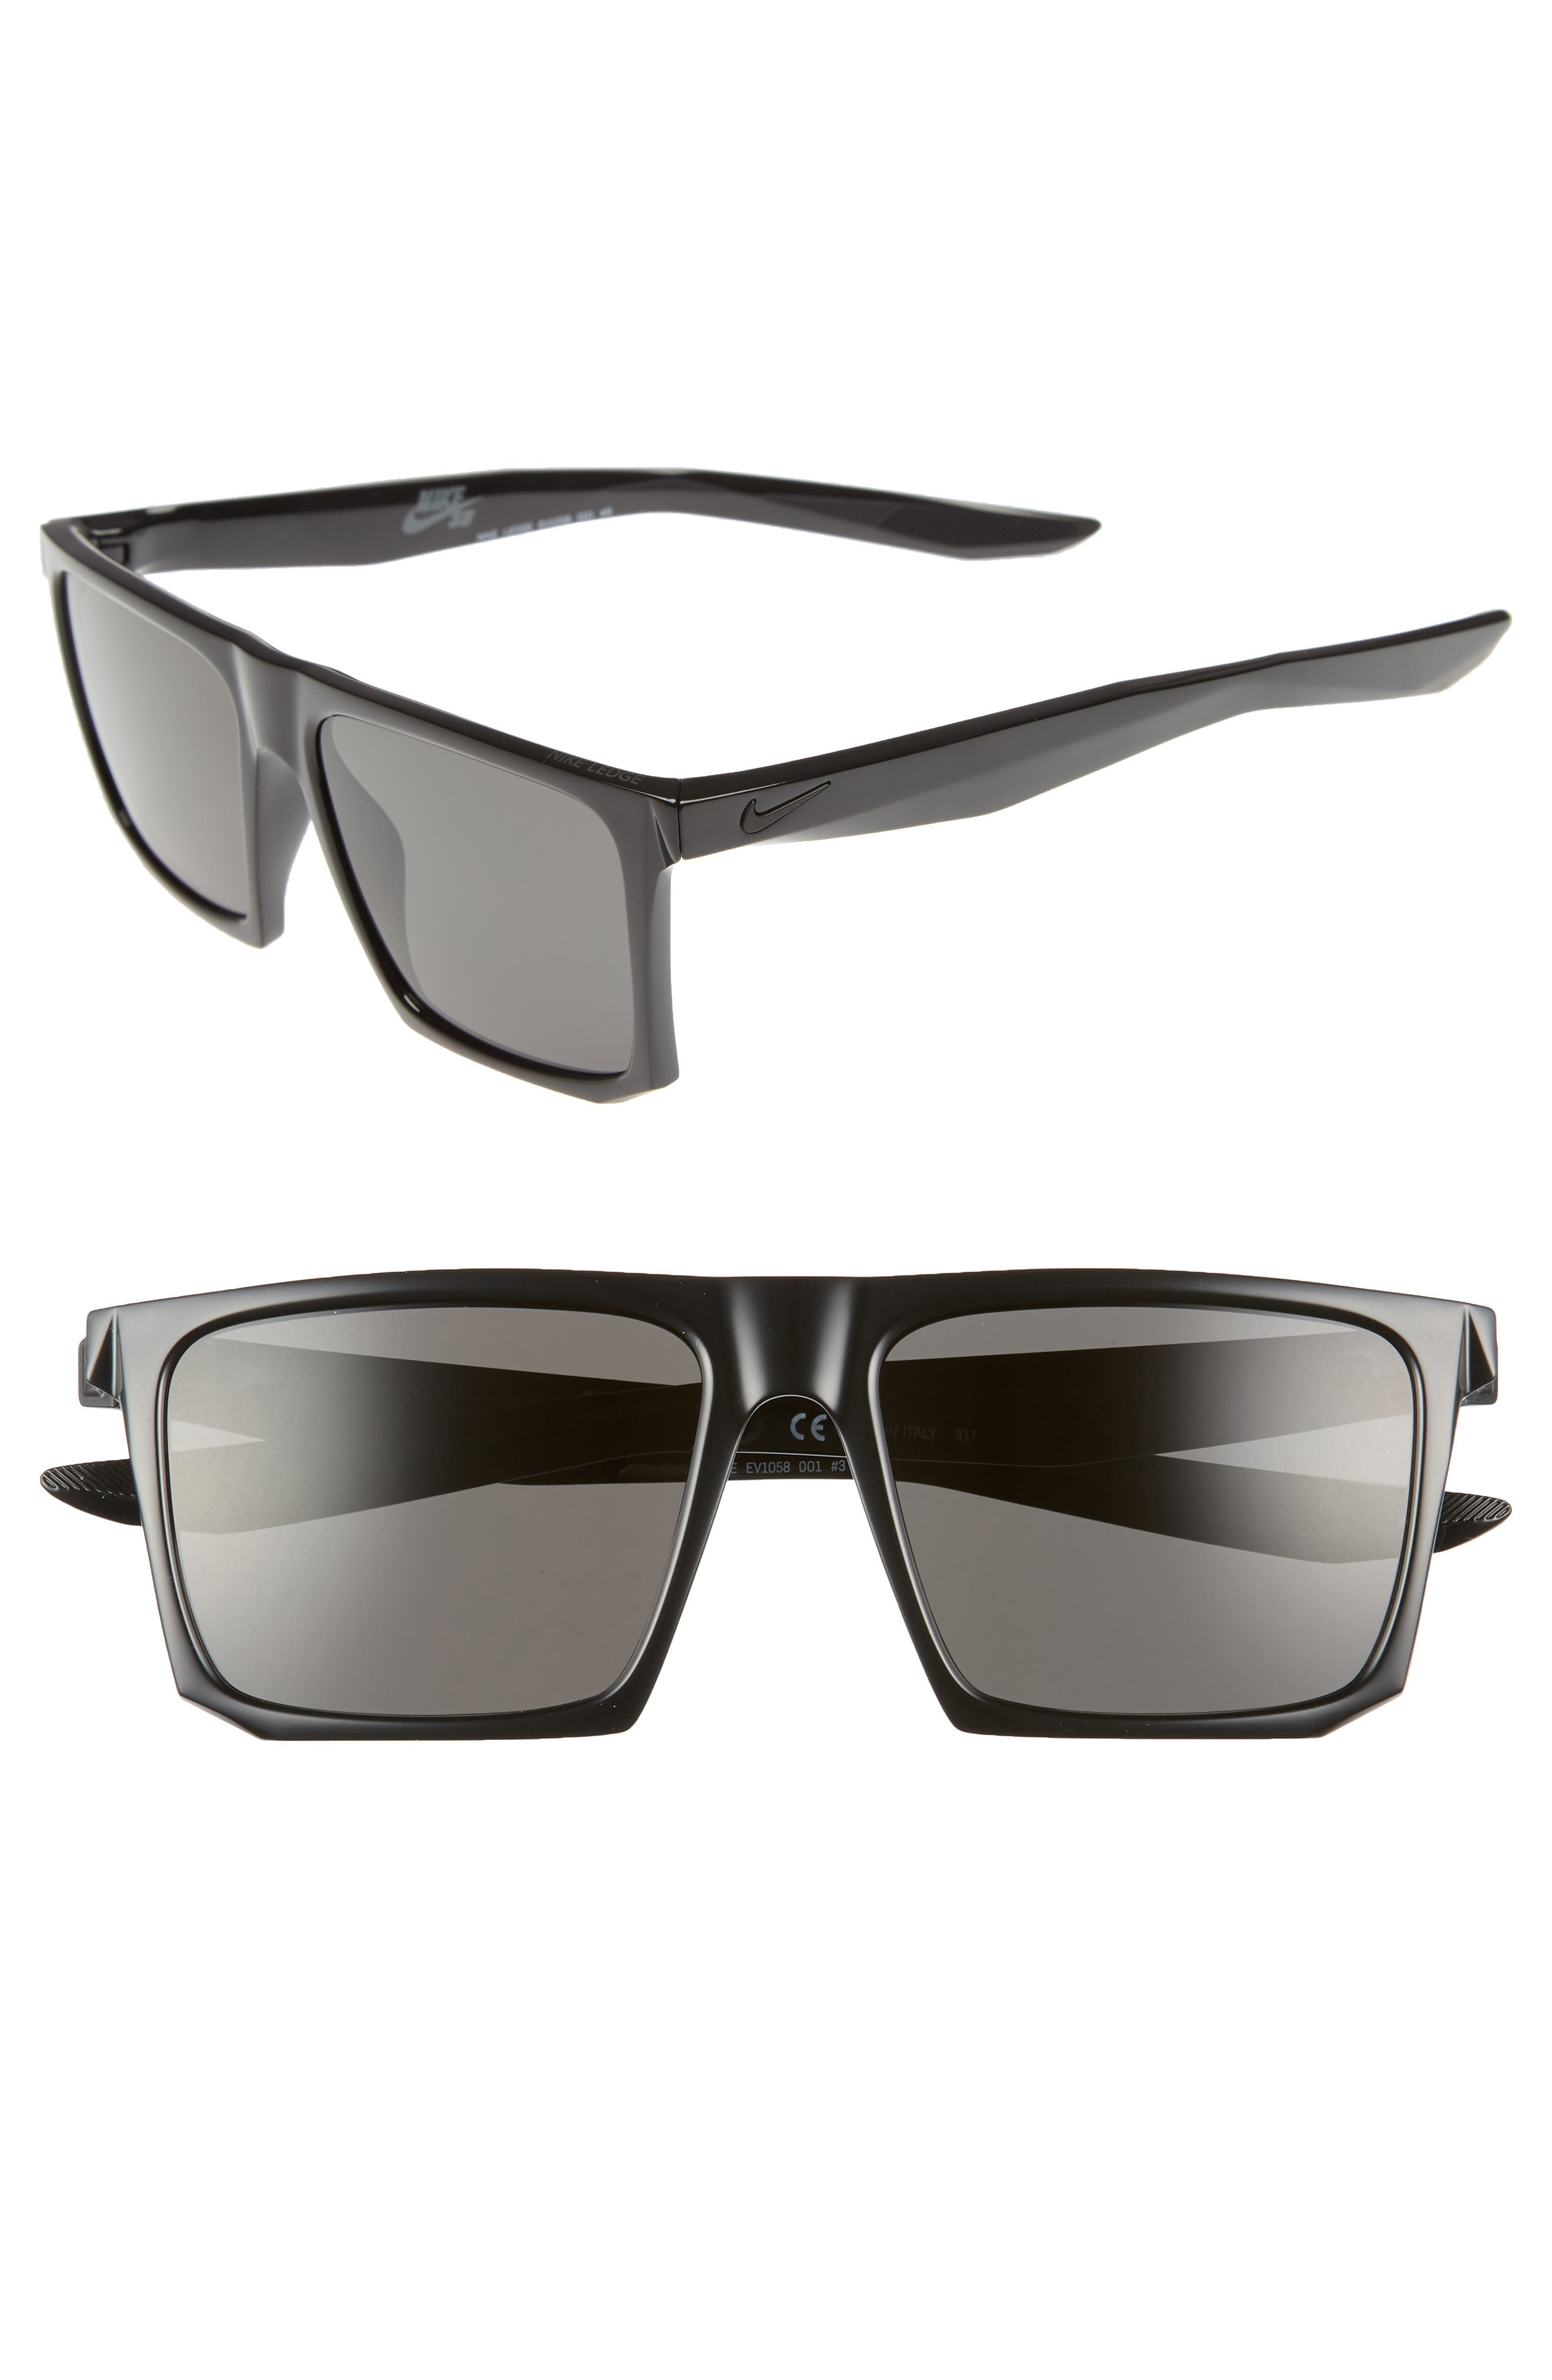 Ledge 56mm Sunglasses,                             Main thumbnail 1, color,                             BLACK/ DARK GREY